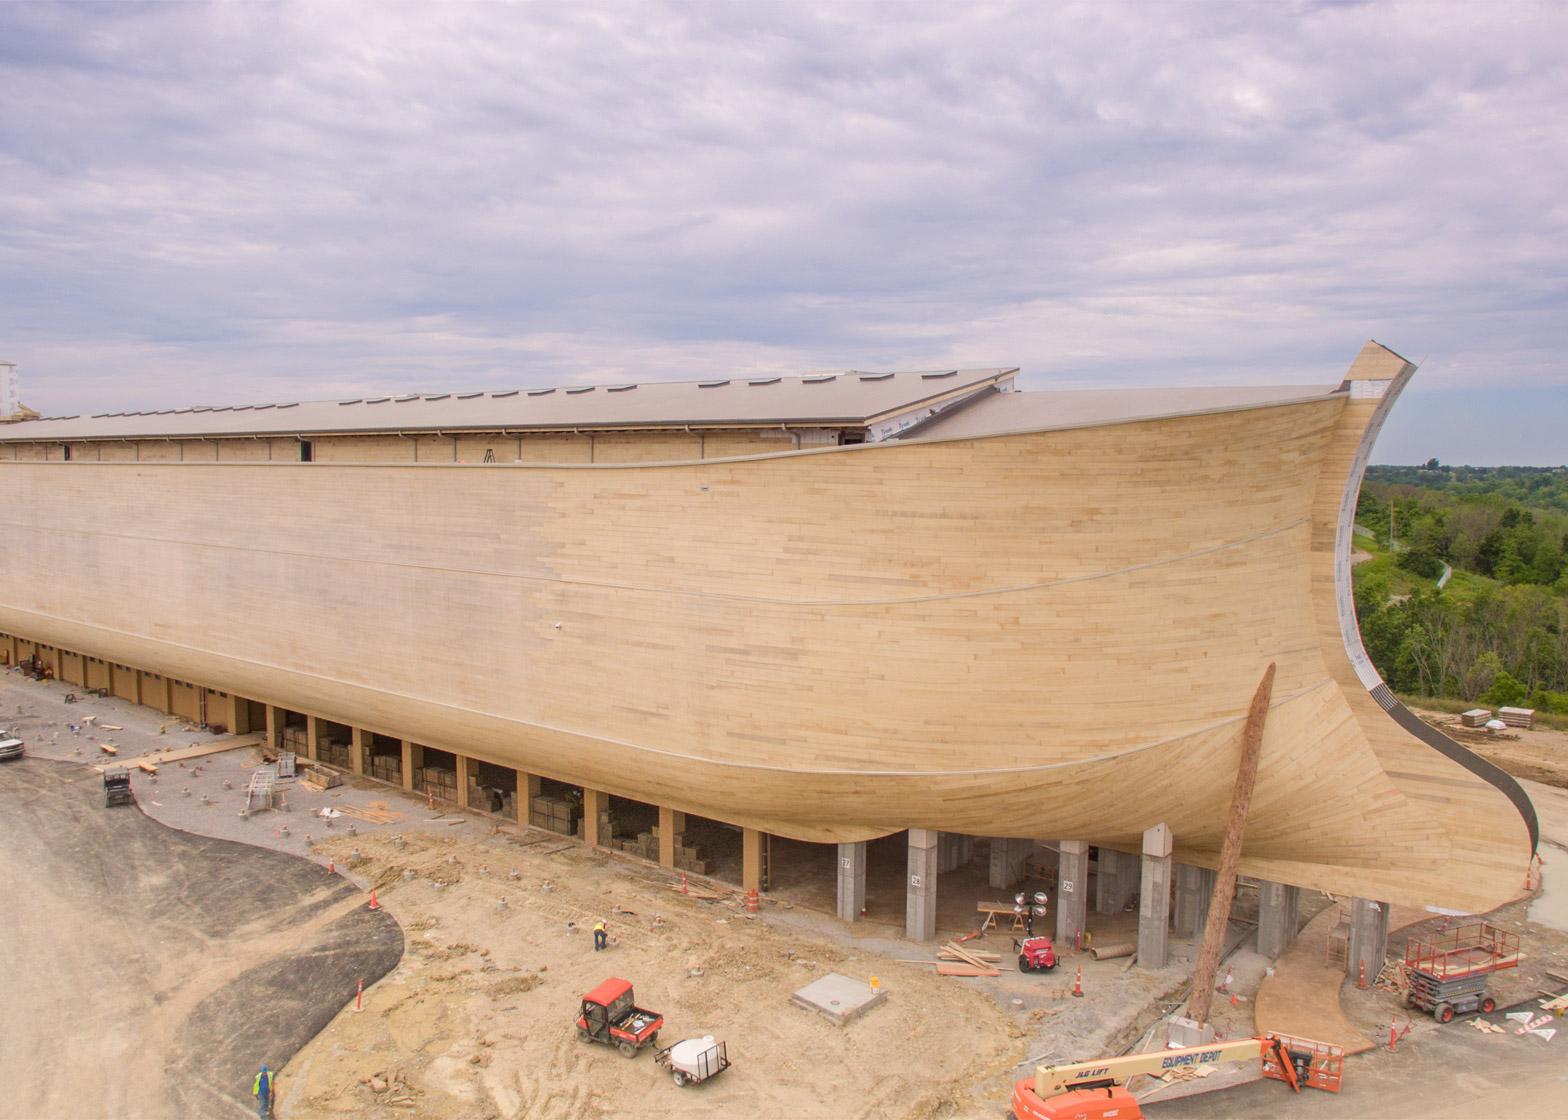 ark-encounter-theme-park-religion-troyer-group-kentucky-usa_dezeen_1568_7.jpg